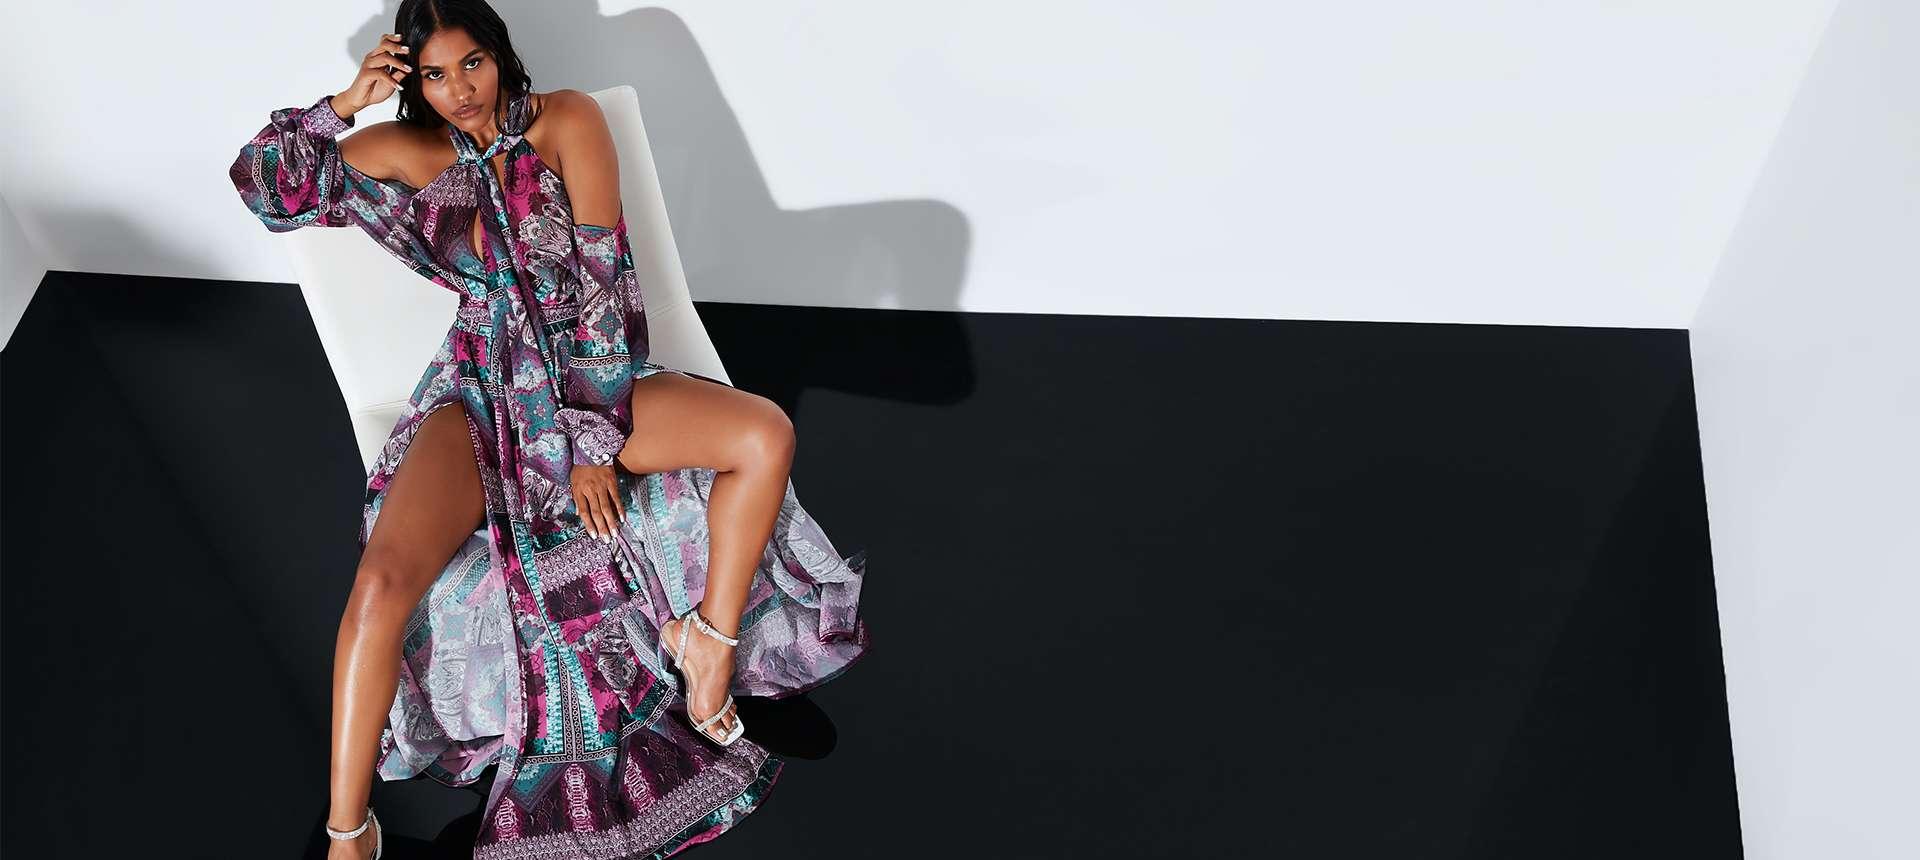 Missguided EU: Women's Clothes | Online Shopping & Fashion